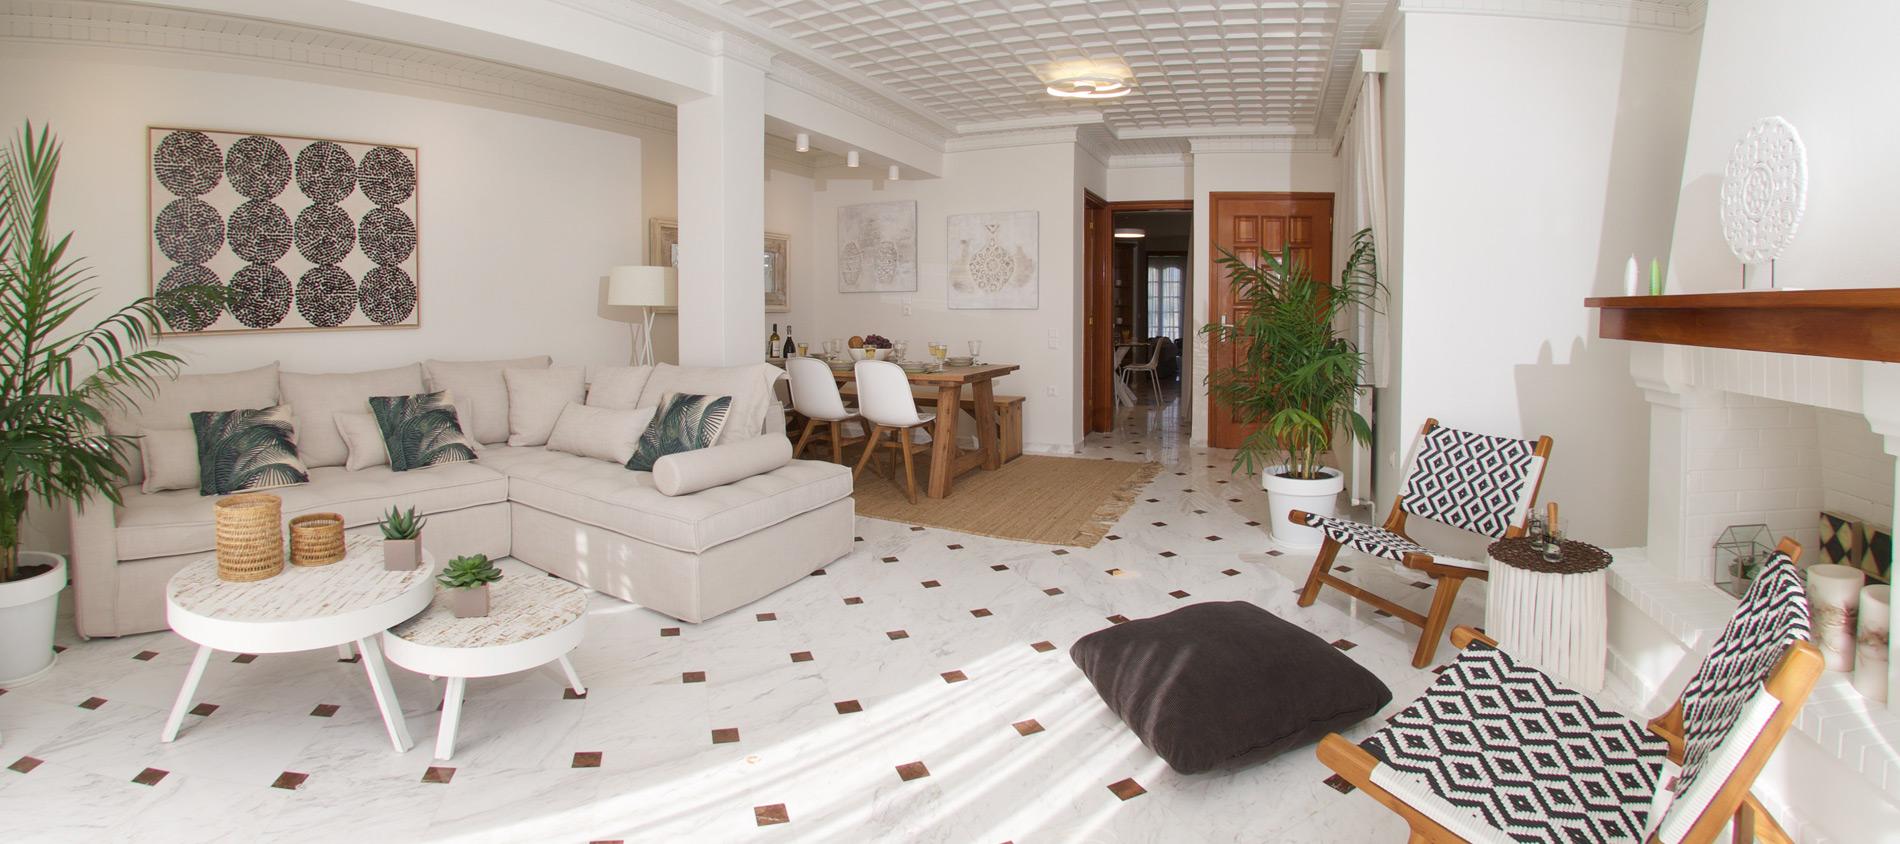 kefalonia_light_suite_lixouri_kefalonia_apartments_01